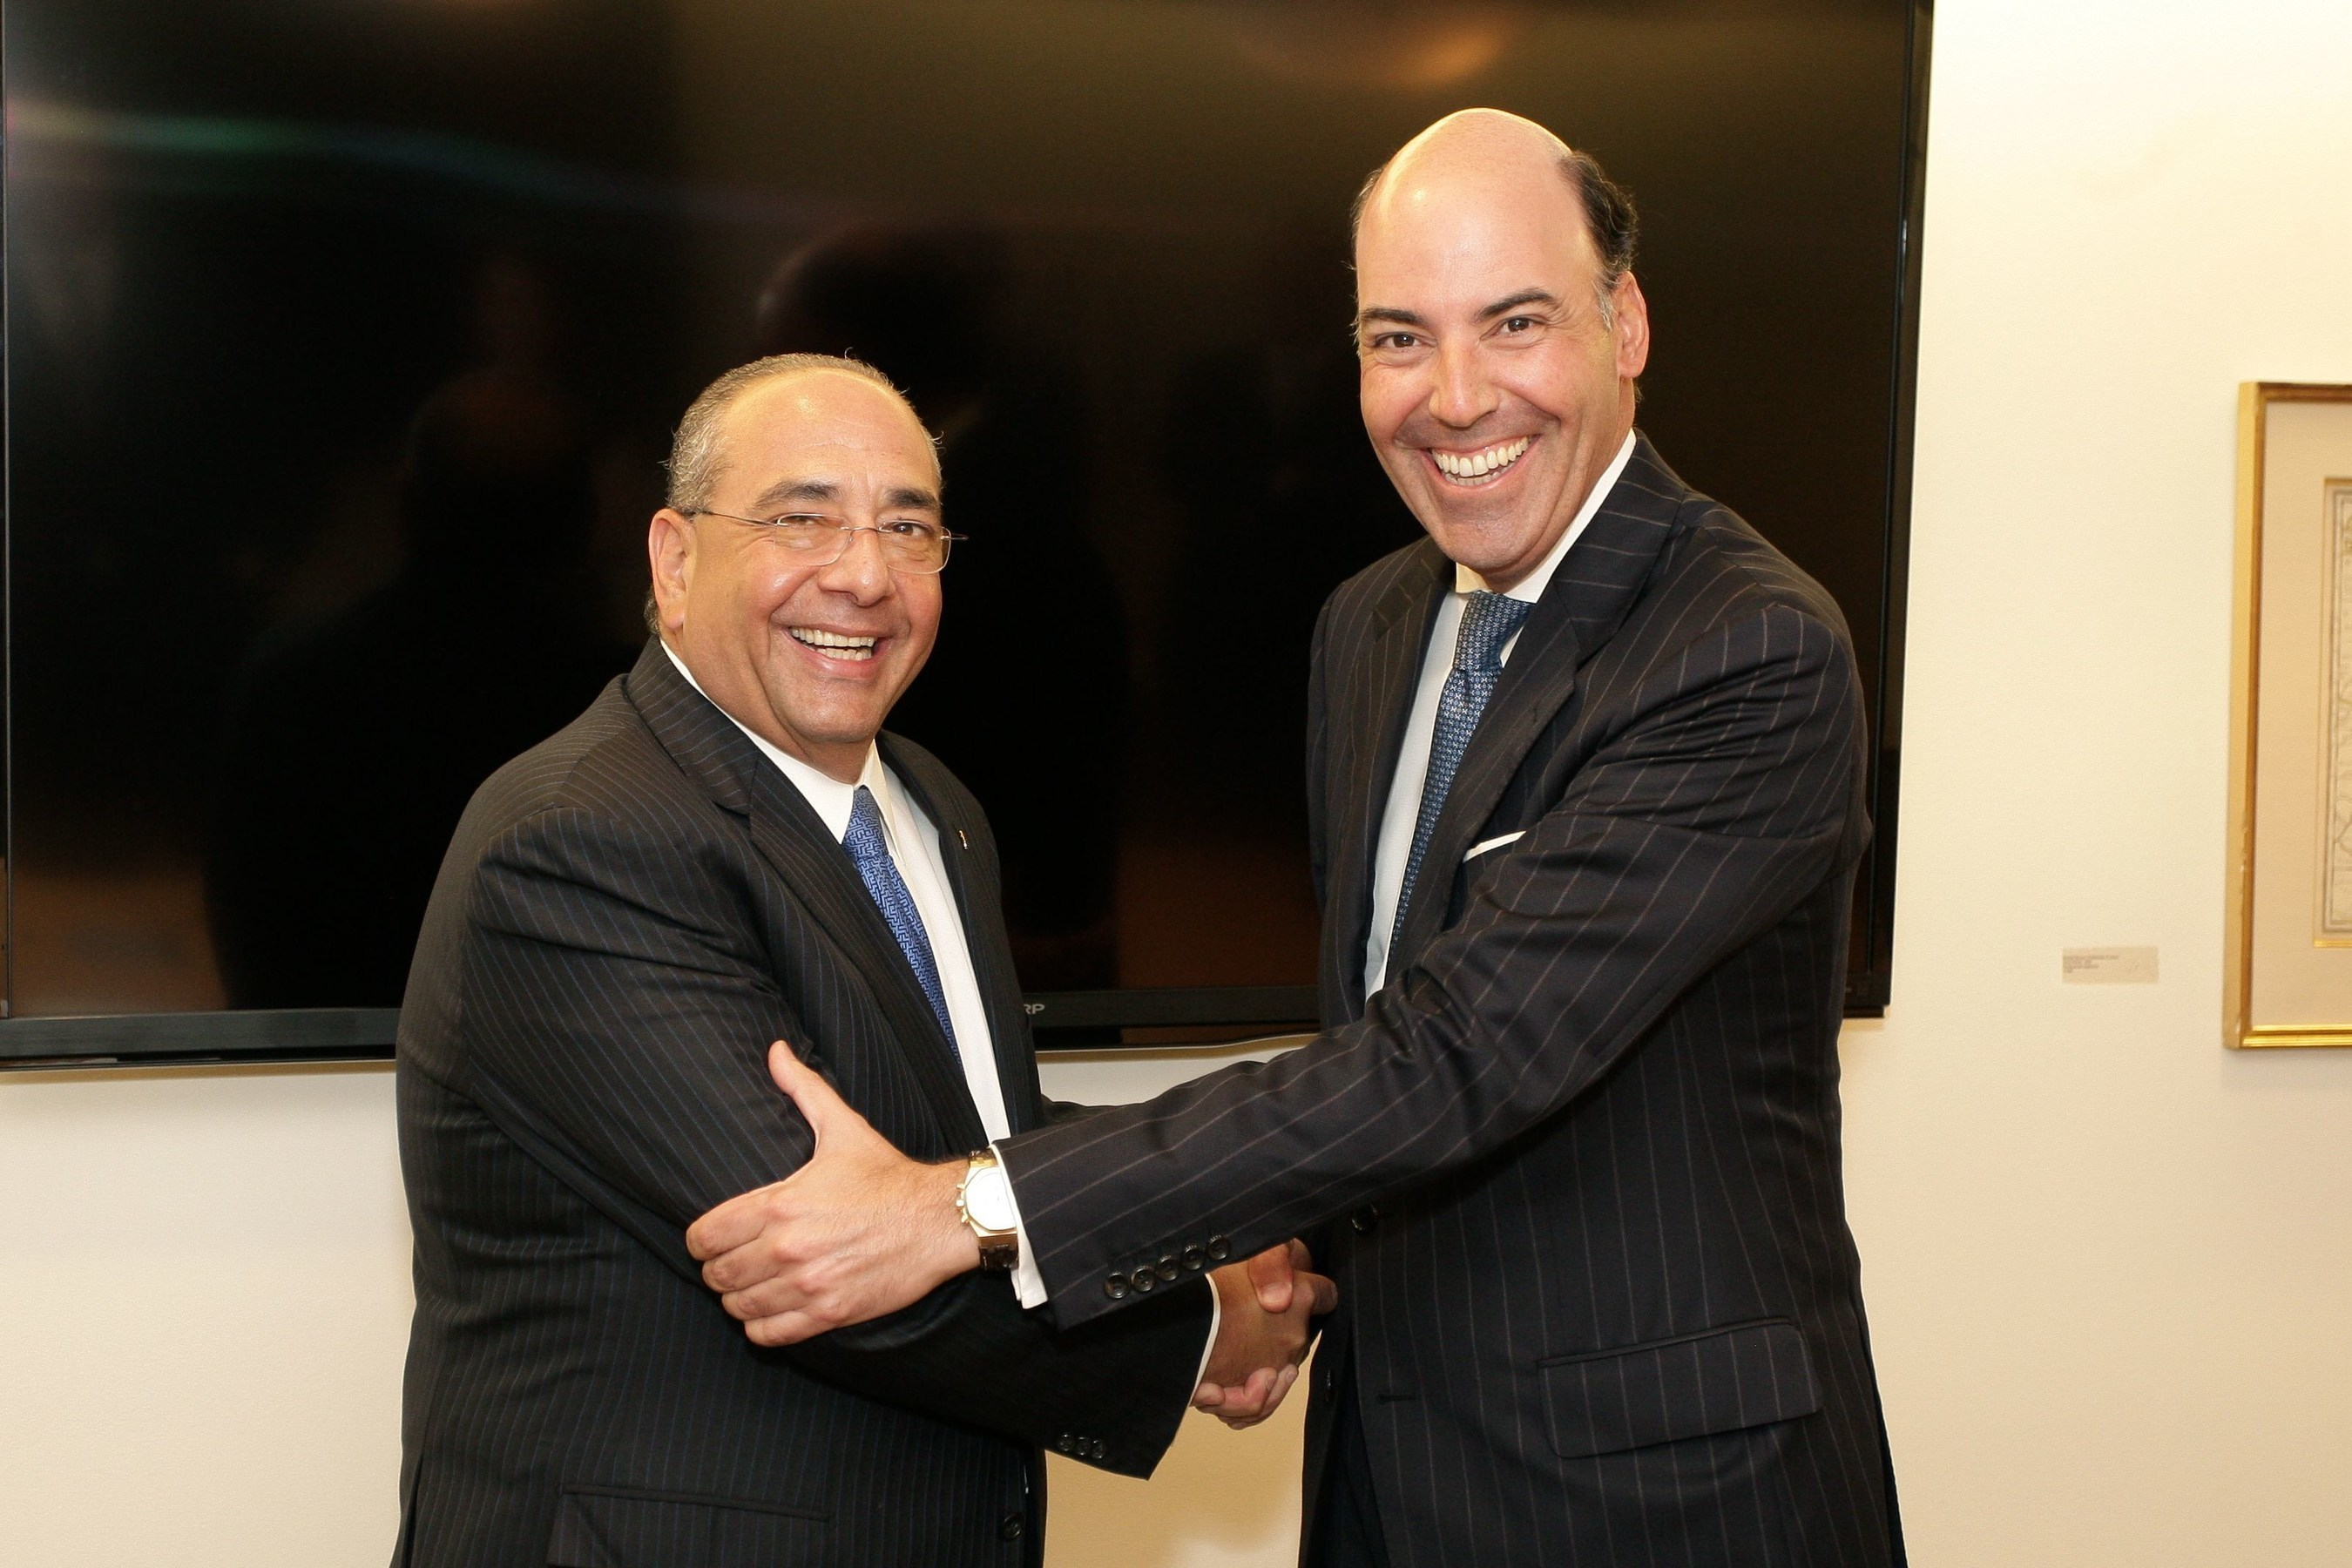 Grupo Financiero Ficohsa CEO, Camilo Atala, and Citi Latin America CEO, Francisco Aristeguieta at the signing of the agreement.